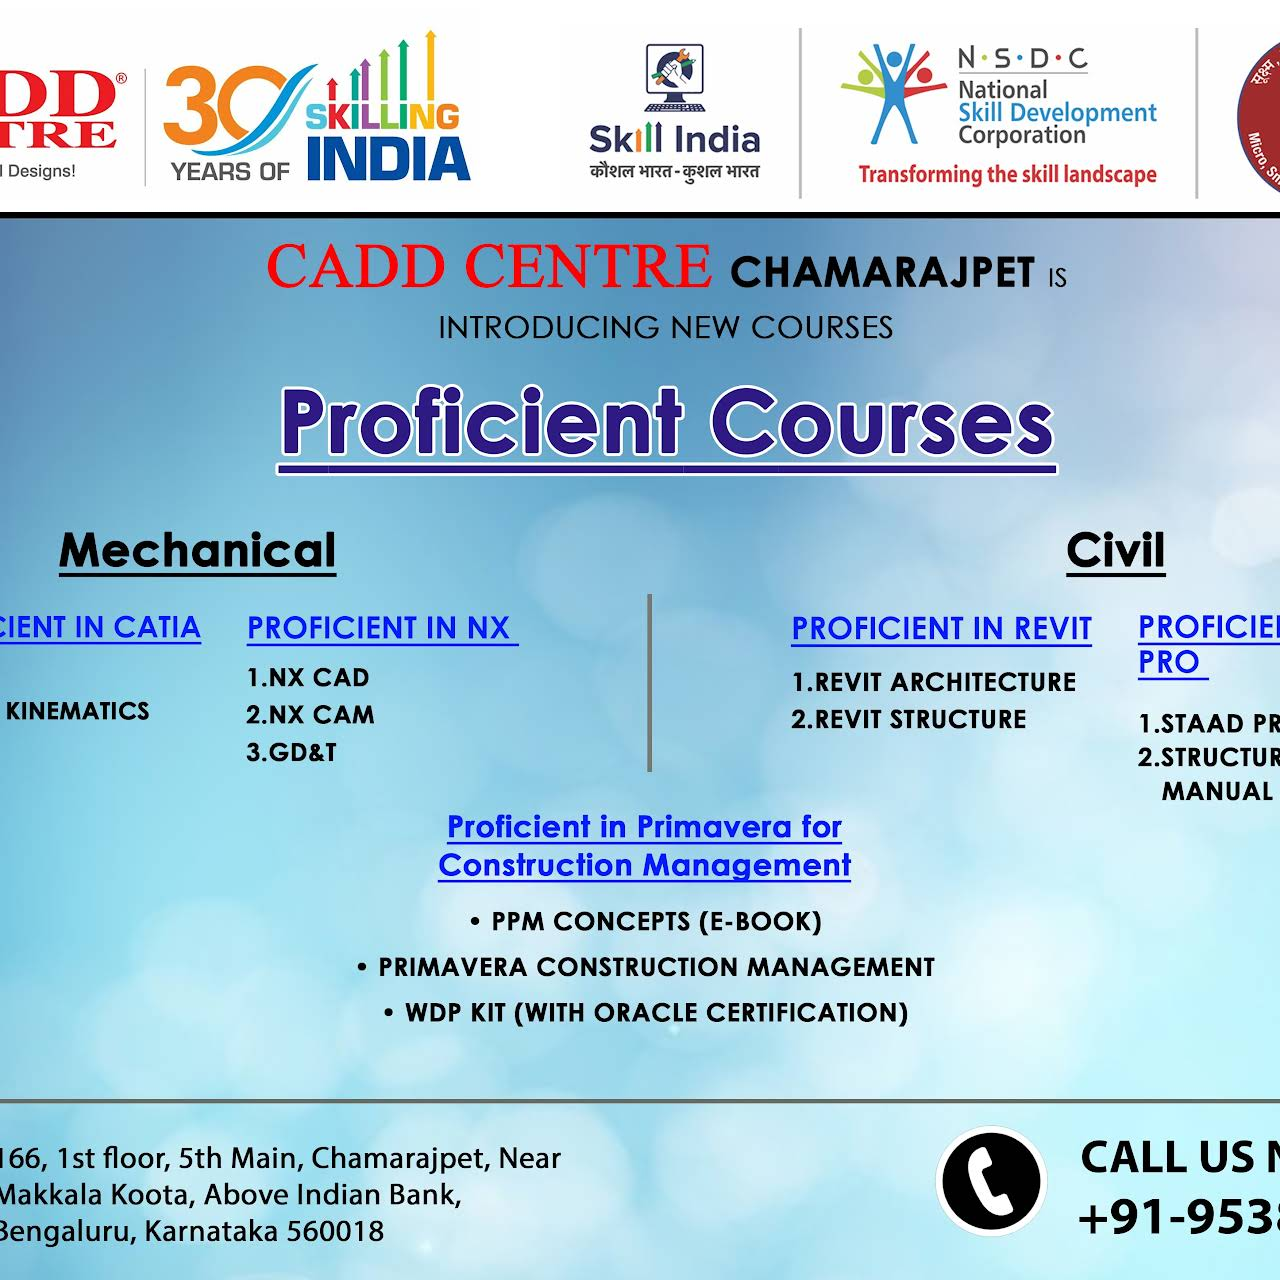 CADD Centre Chamarajpet - Training Centre in Bengaluru